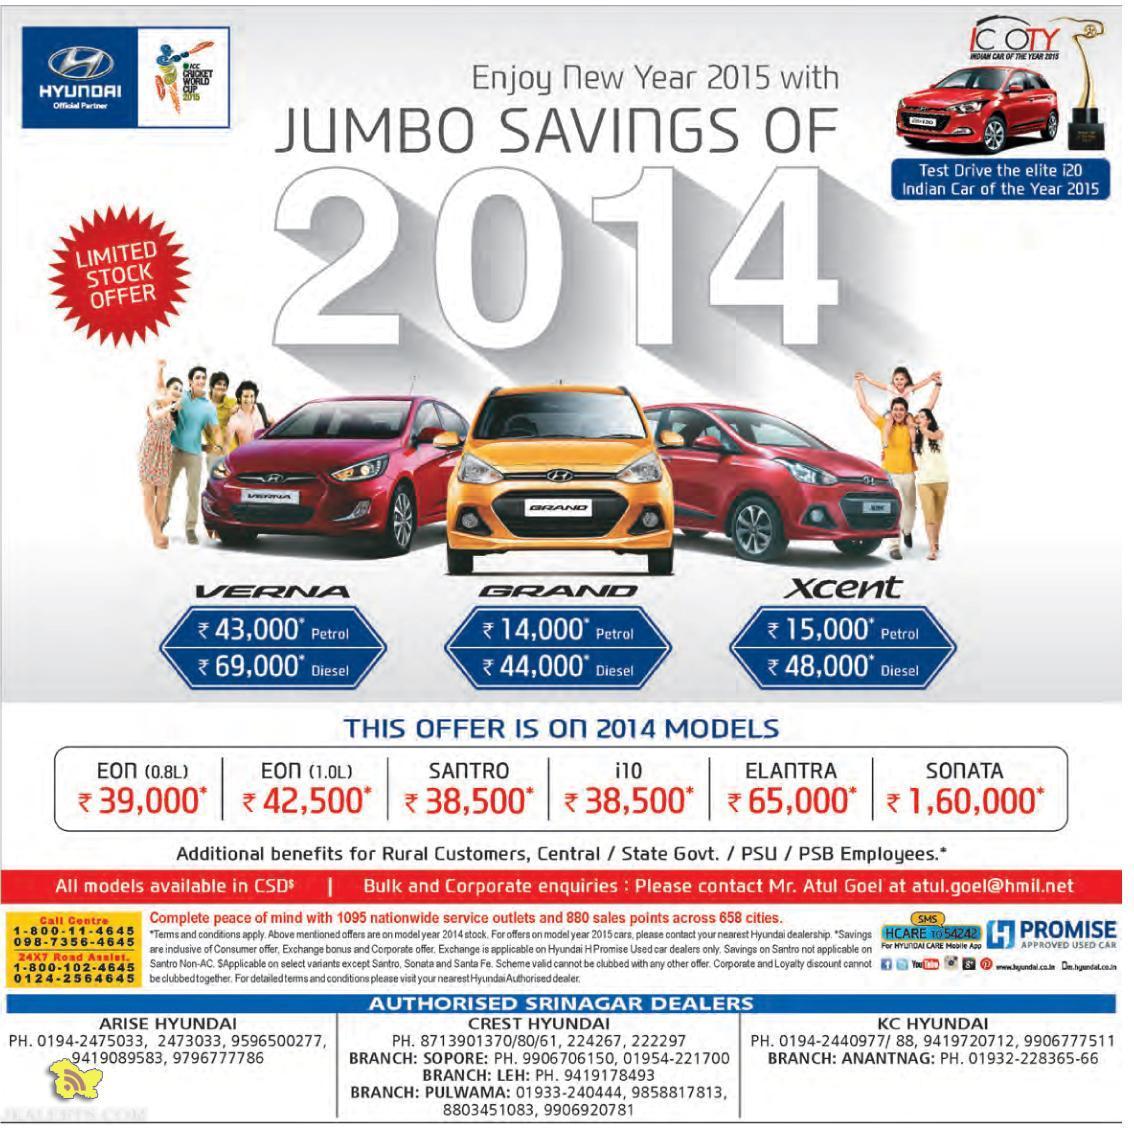 Hyundai Jumbo Savings of 2014, this offer is on 2014 Models